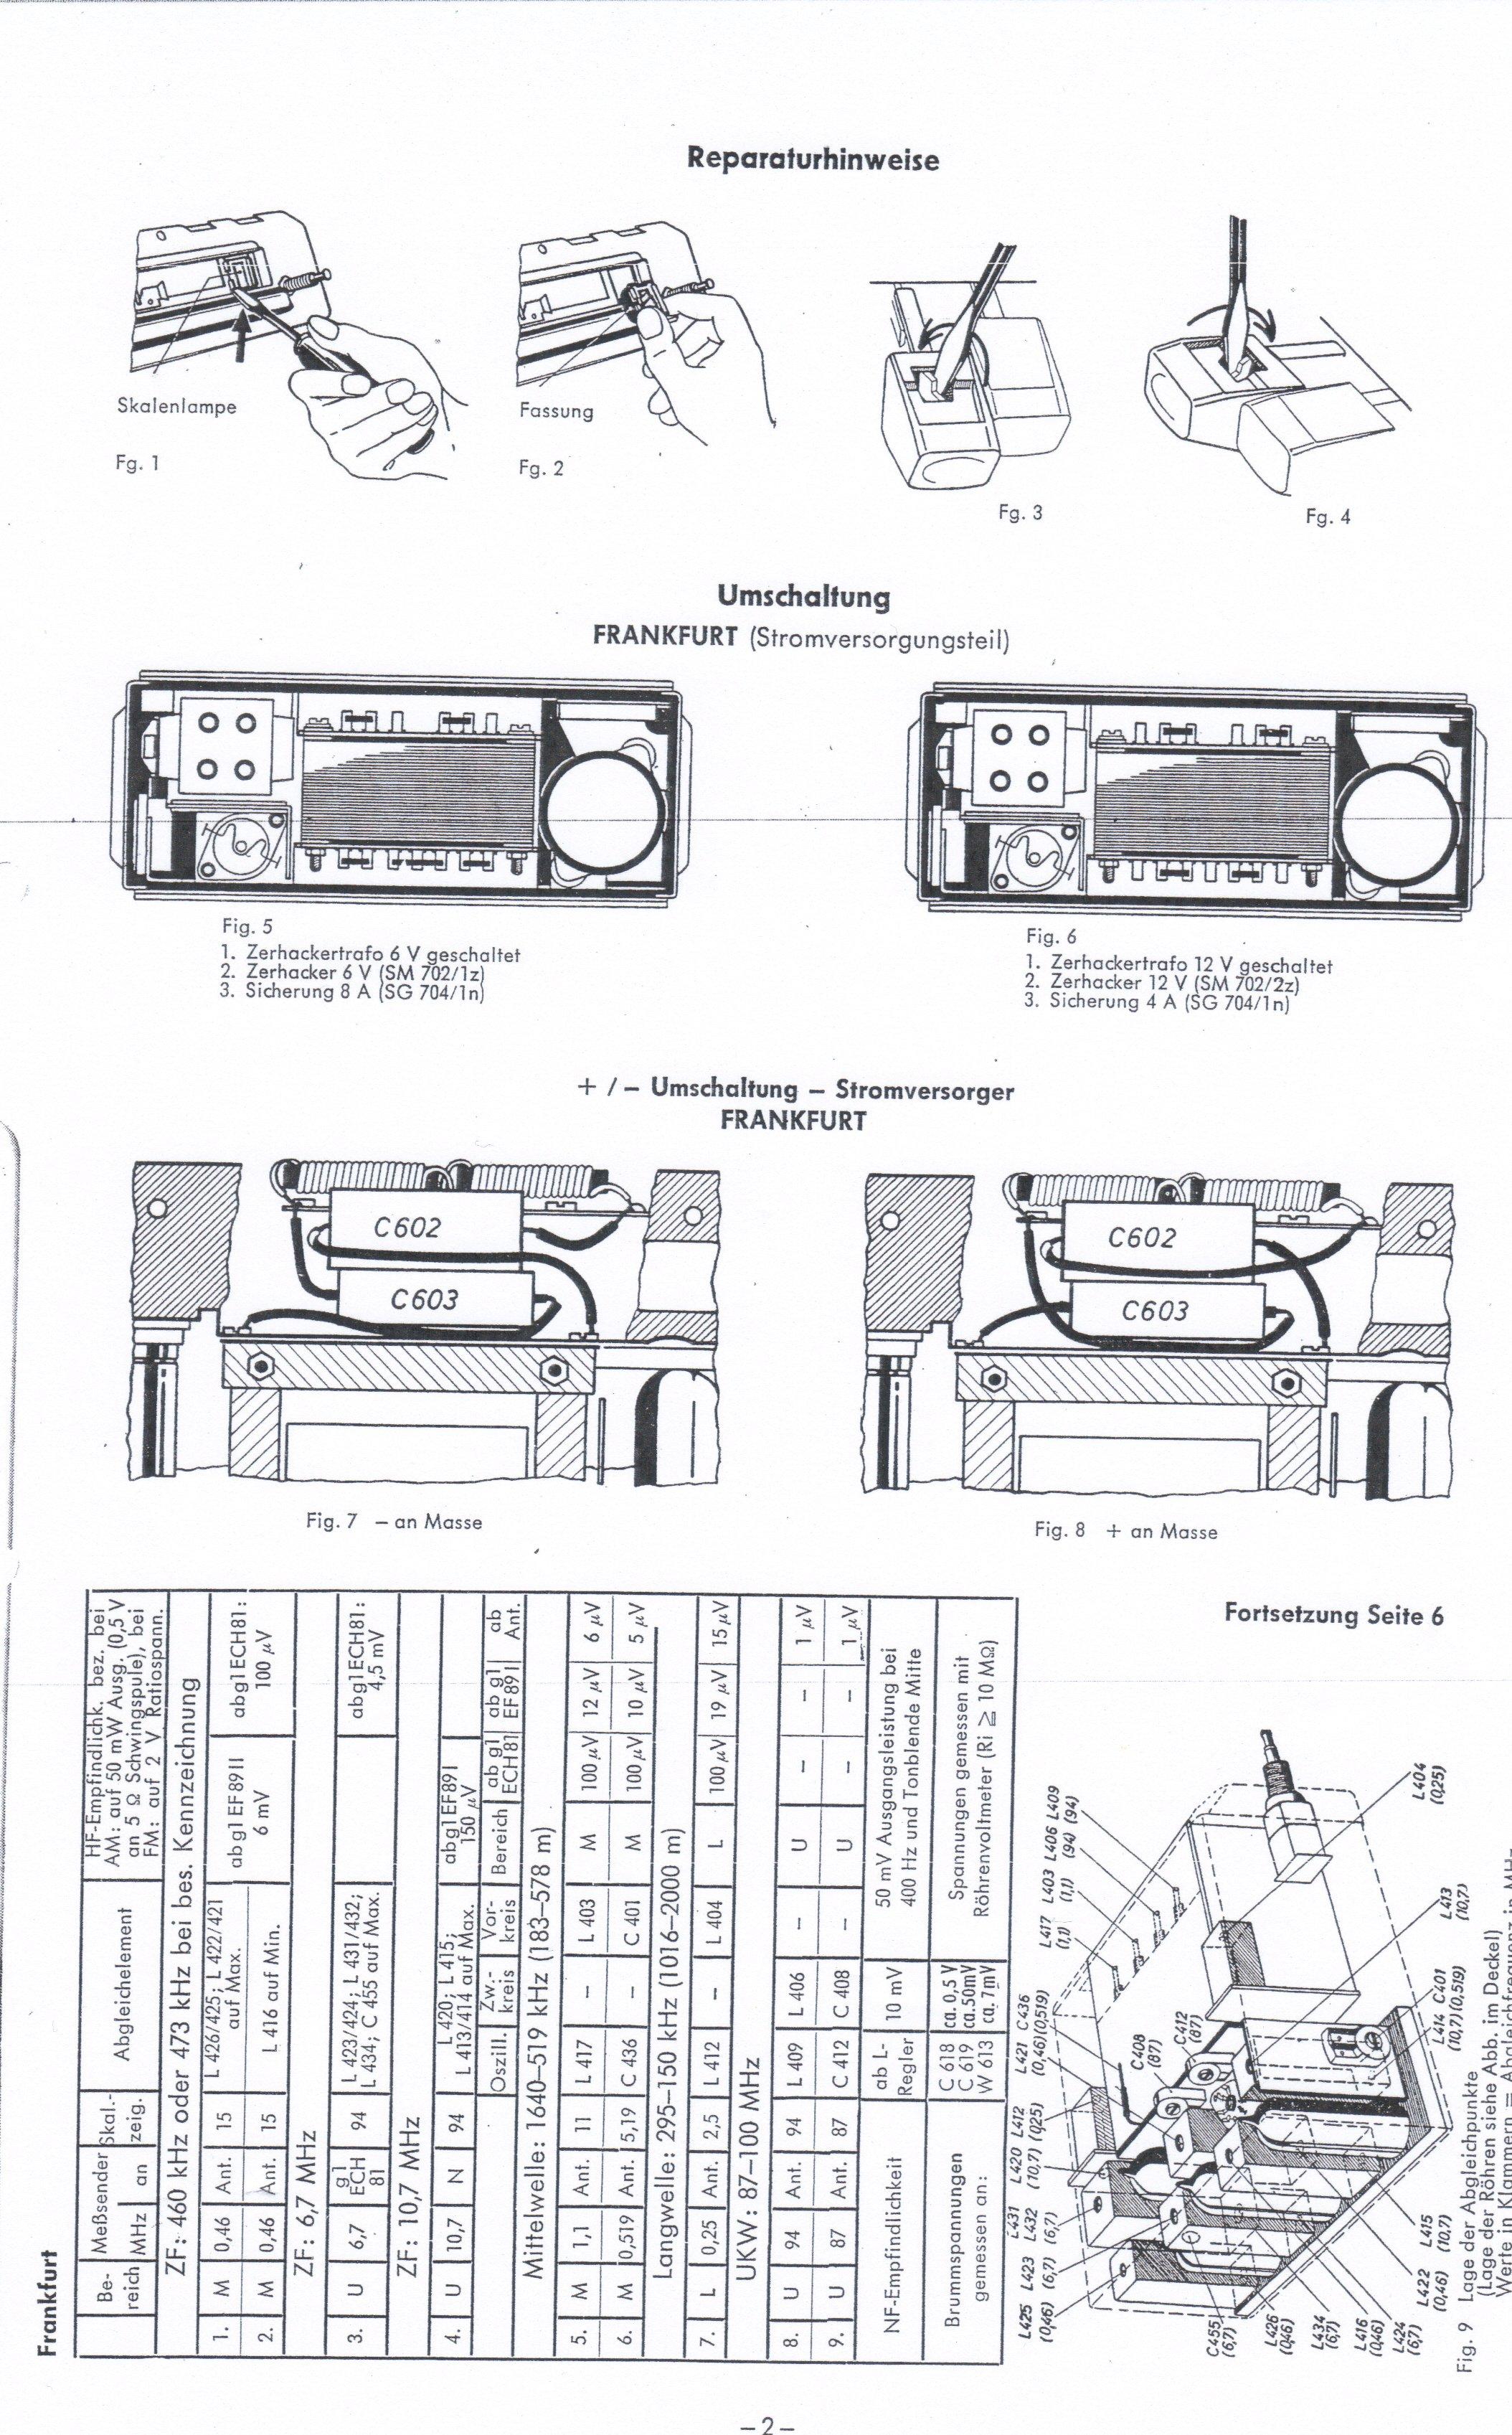 2?resize\\\=665%2C1071\\\&ssl\\\=1 blaupunkt rpd 552 wiring diagram blaupunkt rpd 552 wiring diagram Speaker Crossovers Circuit Diagrams at eliteediting.co